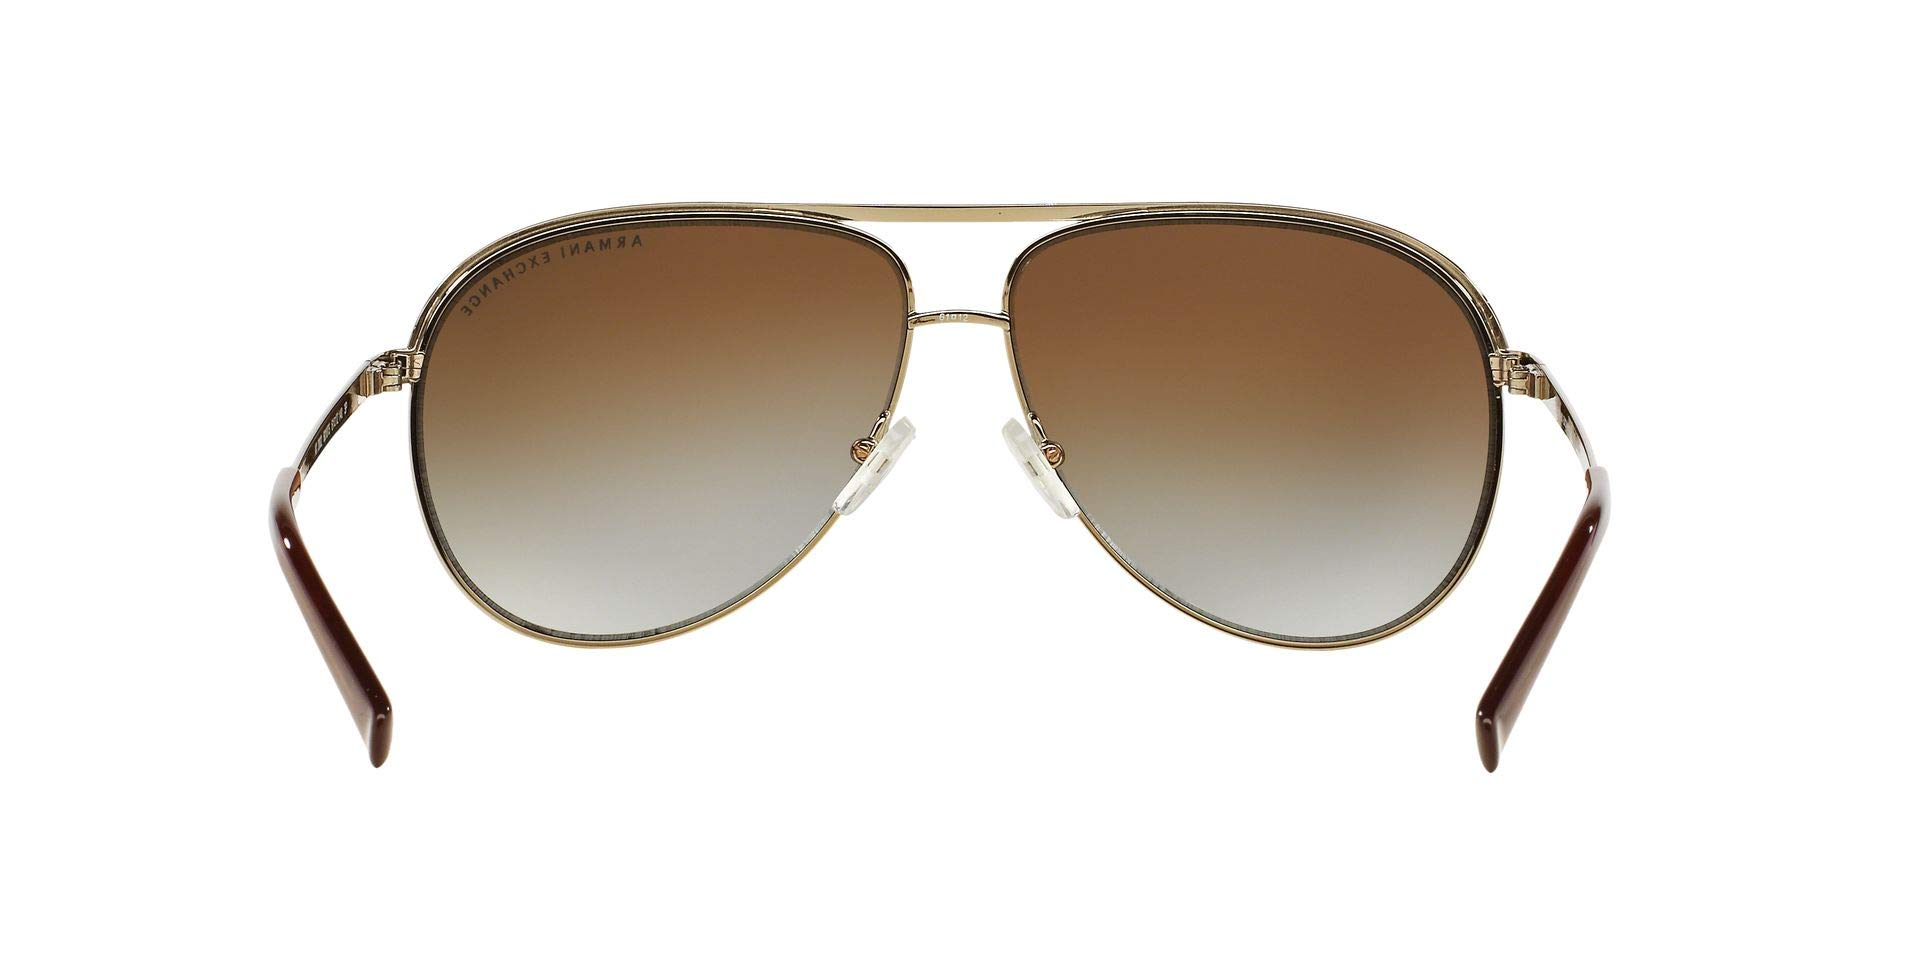 Armani Exchange Metal Unisex Polarized Aviator Sunglasses, Light Gold/Dark Brown, 61 mm by A|X Armani Exchange (Image #8)